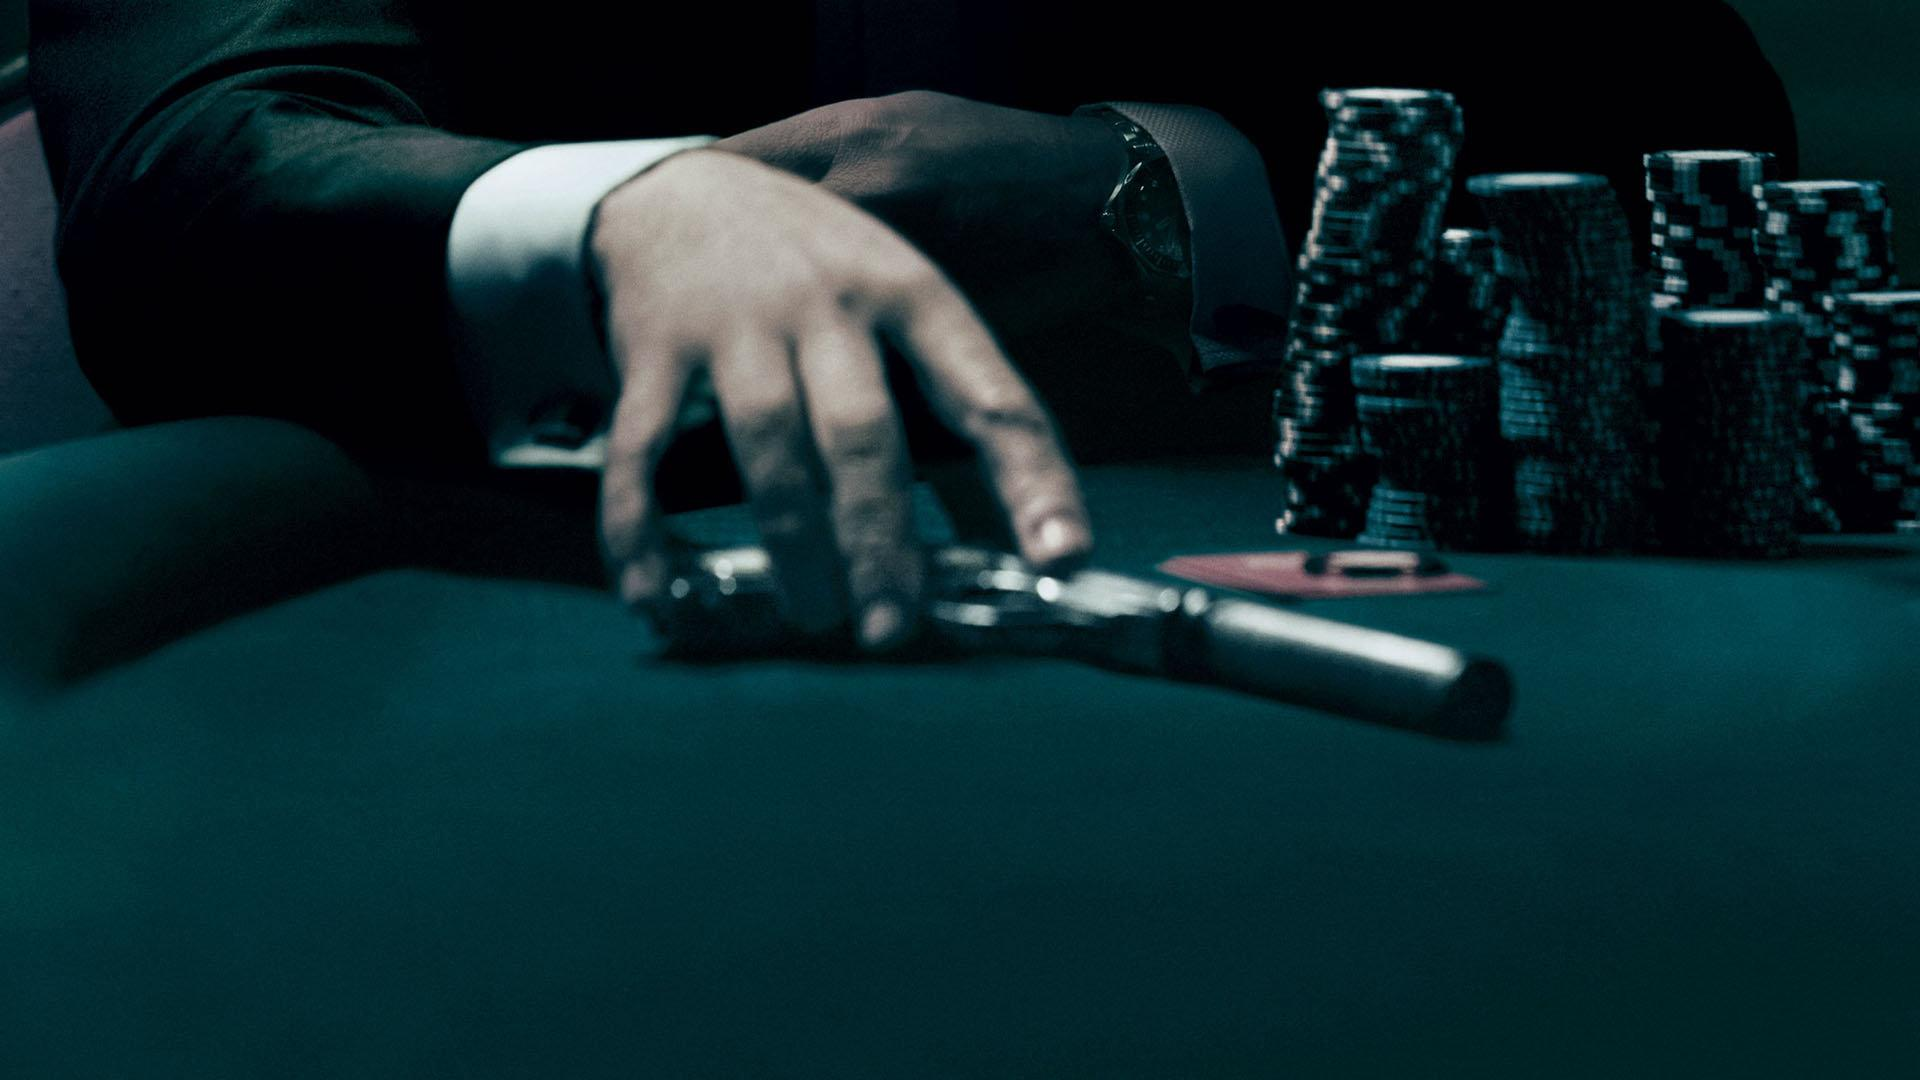 Raja poker dunia